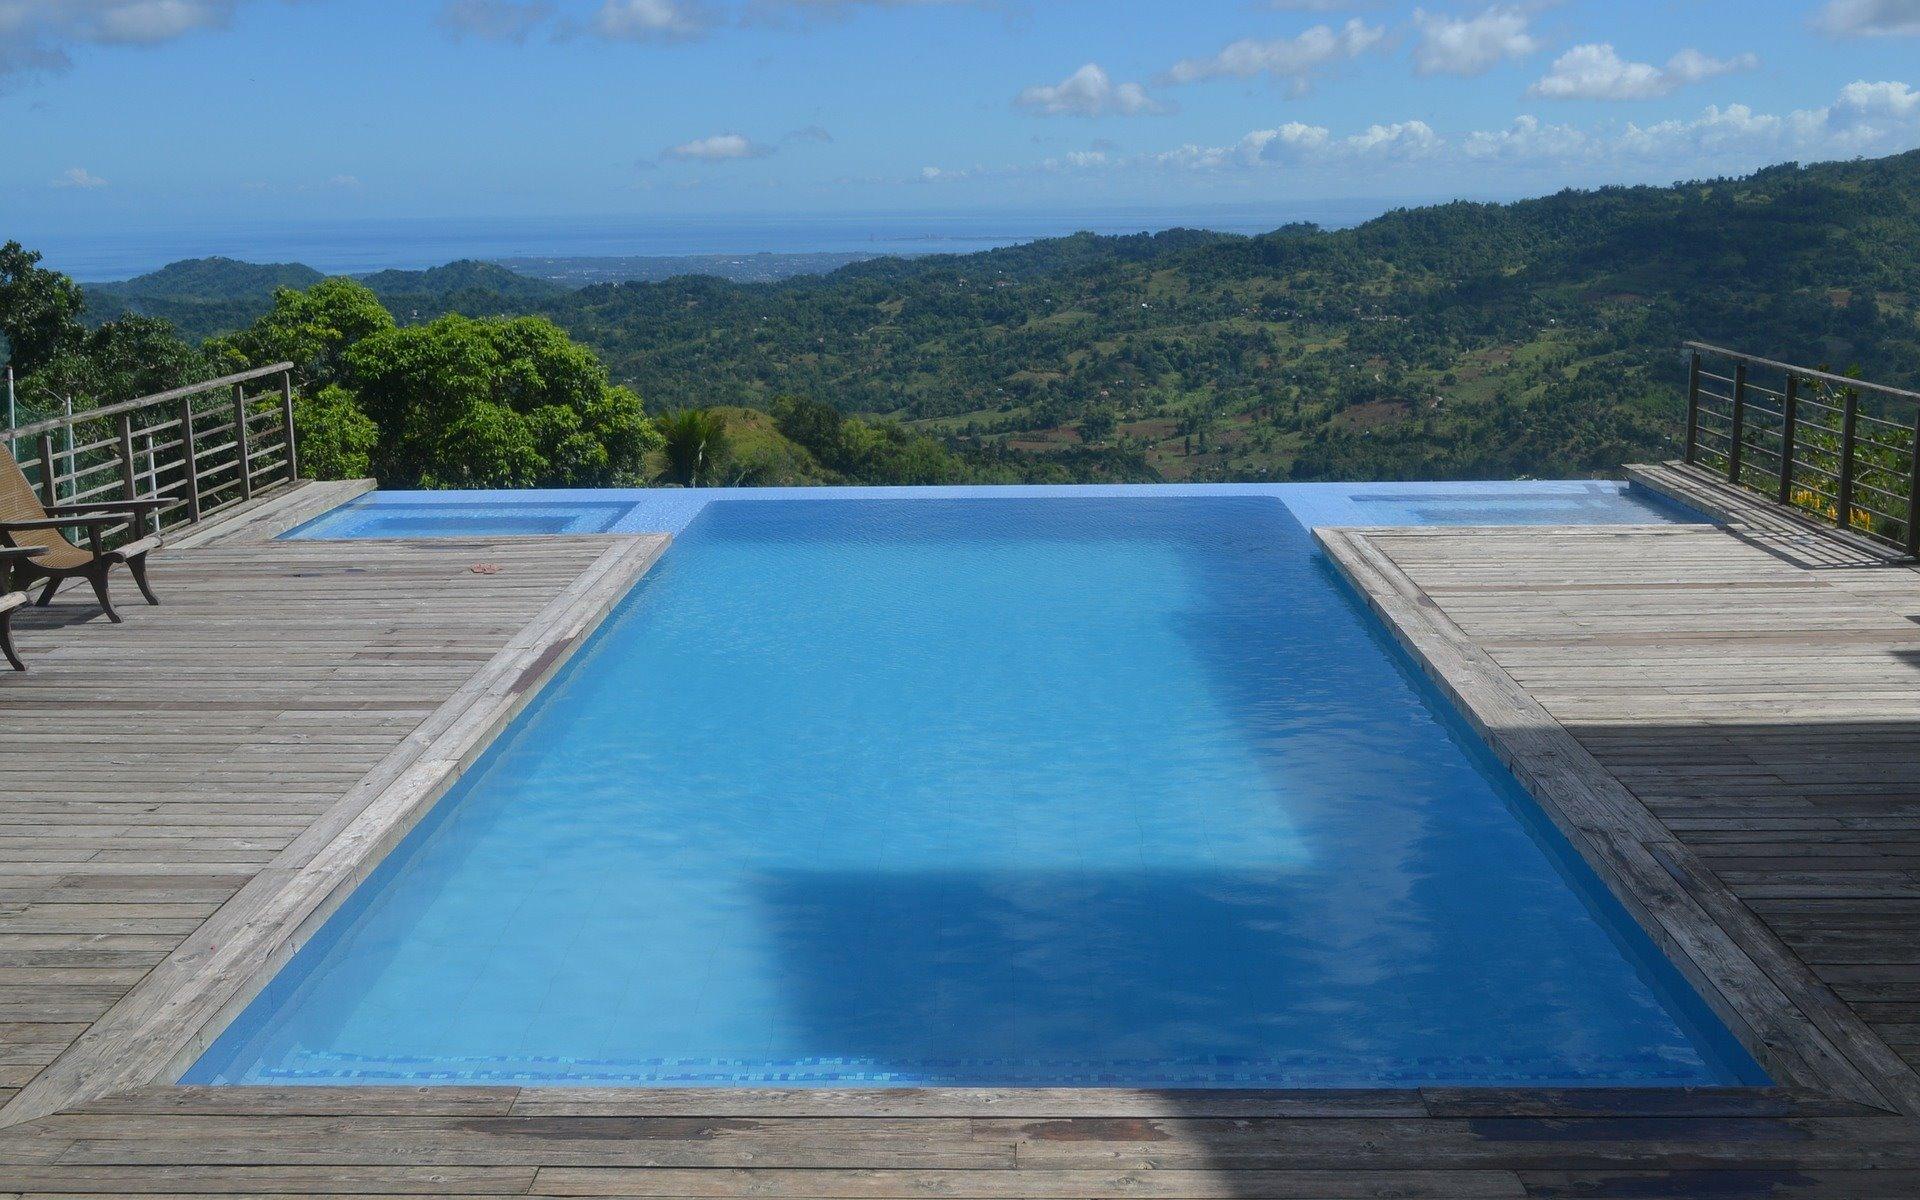 Infinity Privat Pool in der Eifel